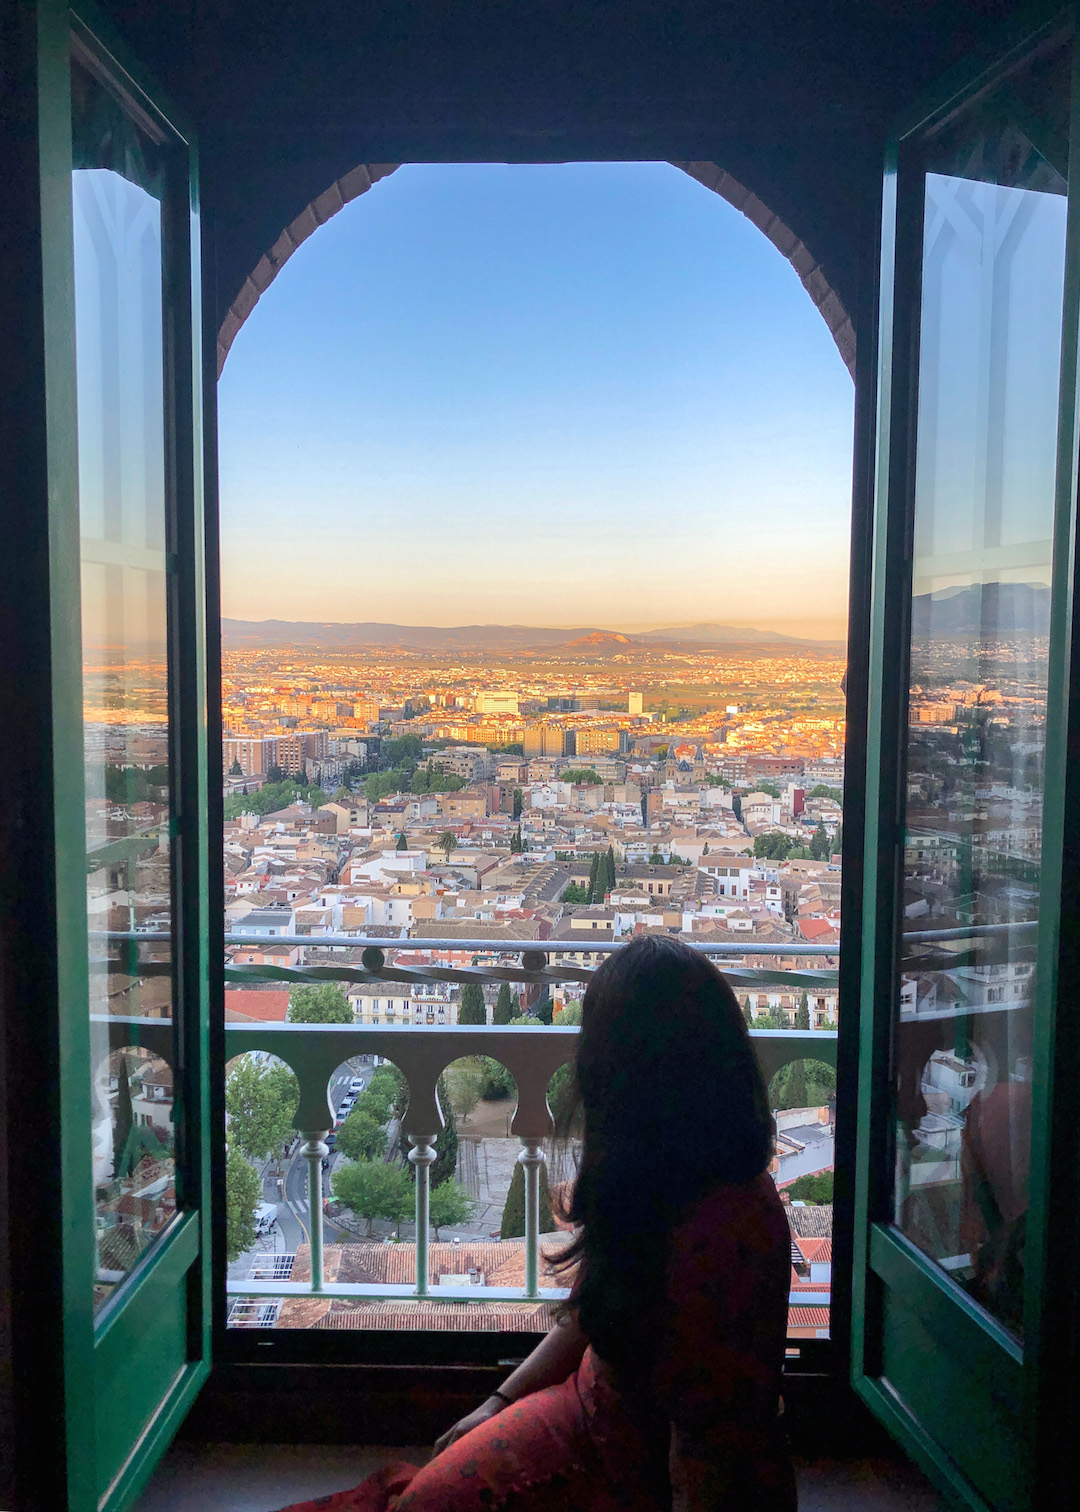 Her_Travel_Edit_Granada_Alhambra_Palace_Hotel